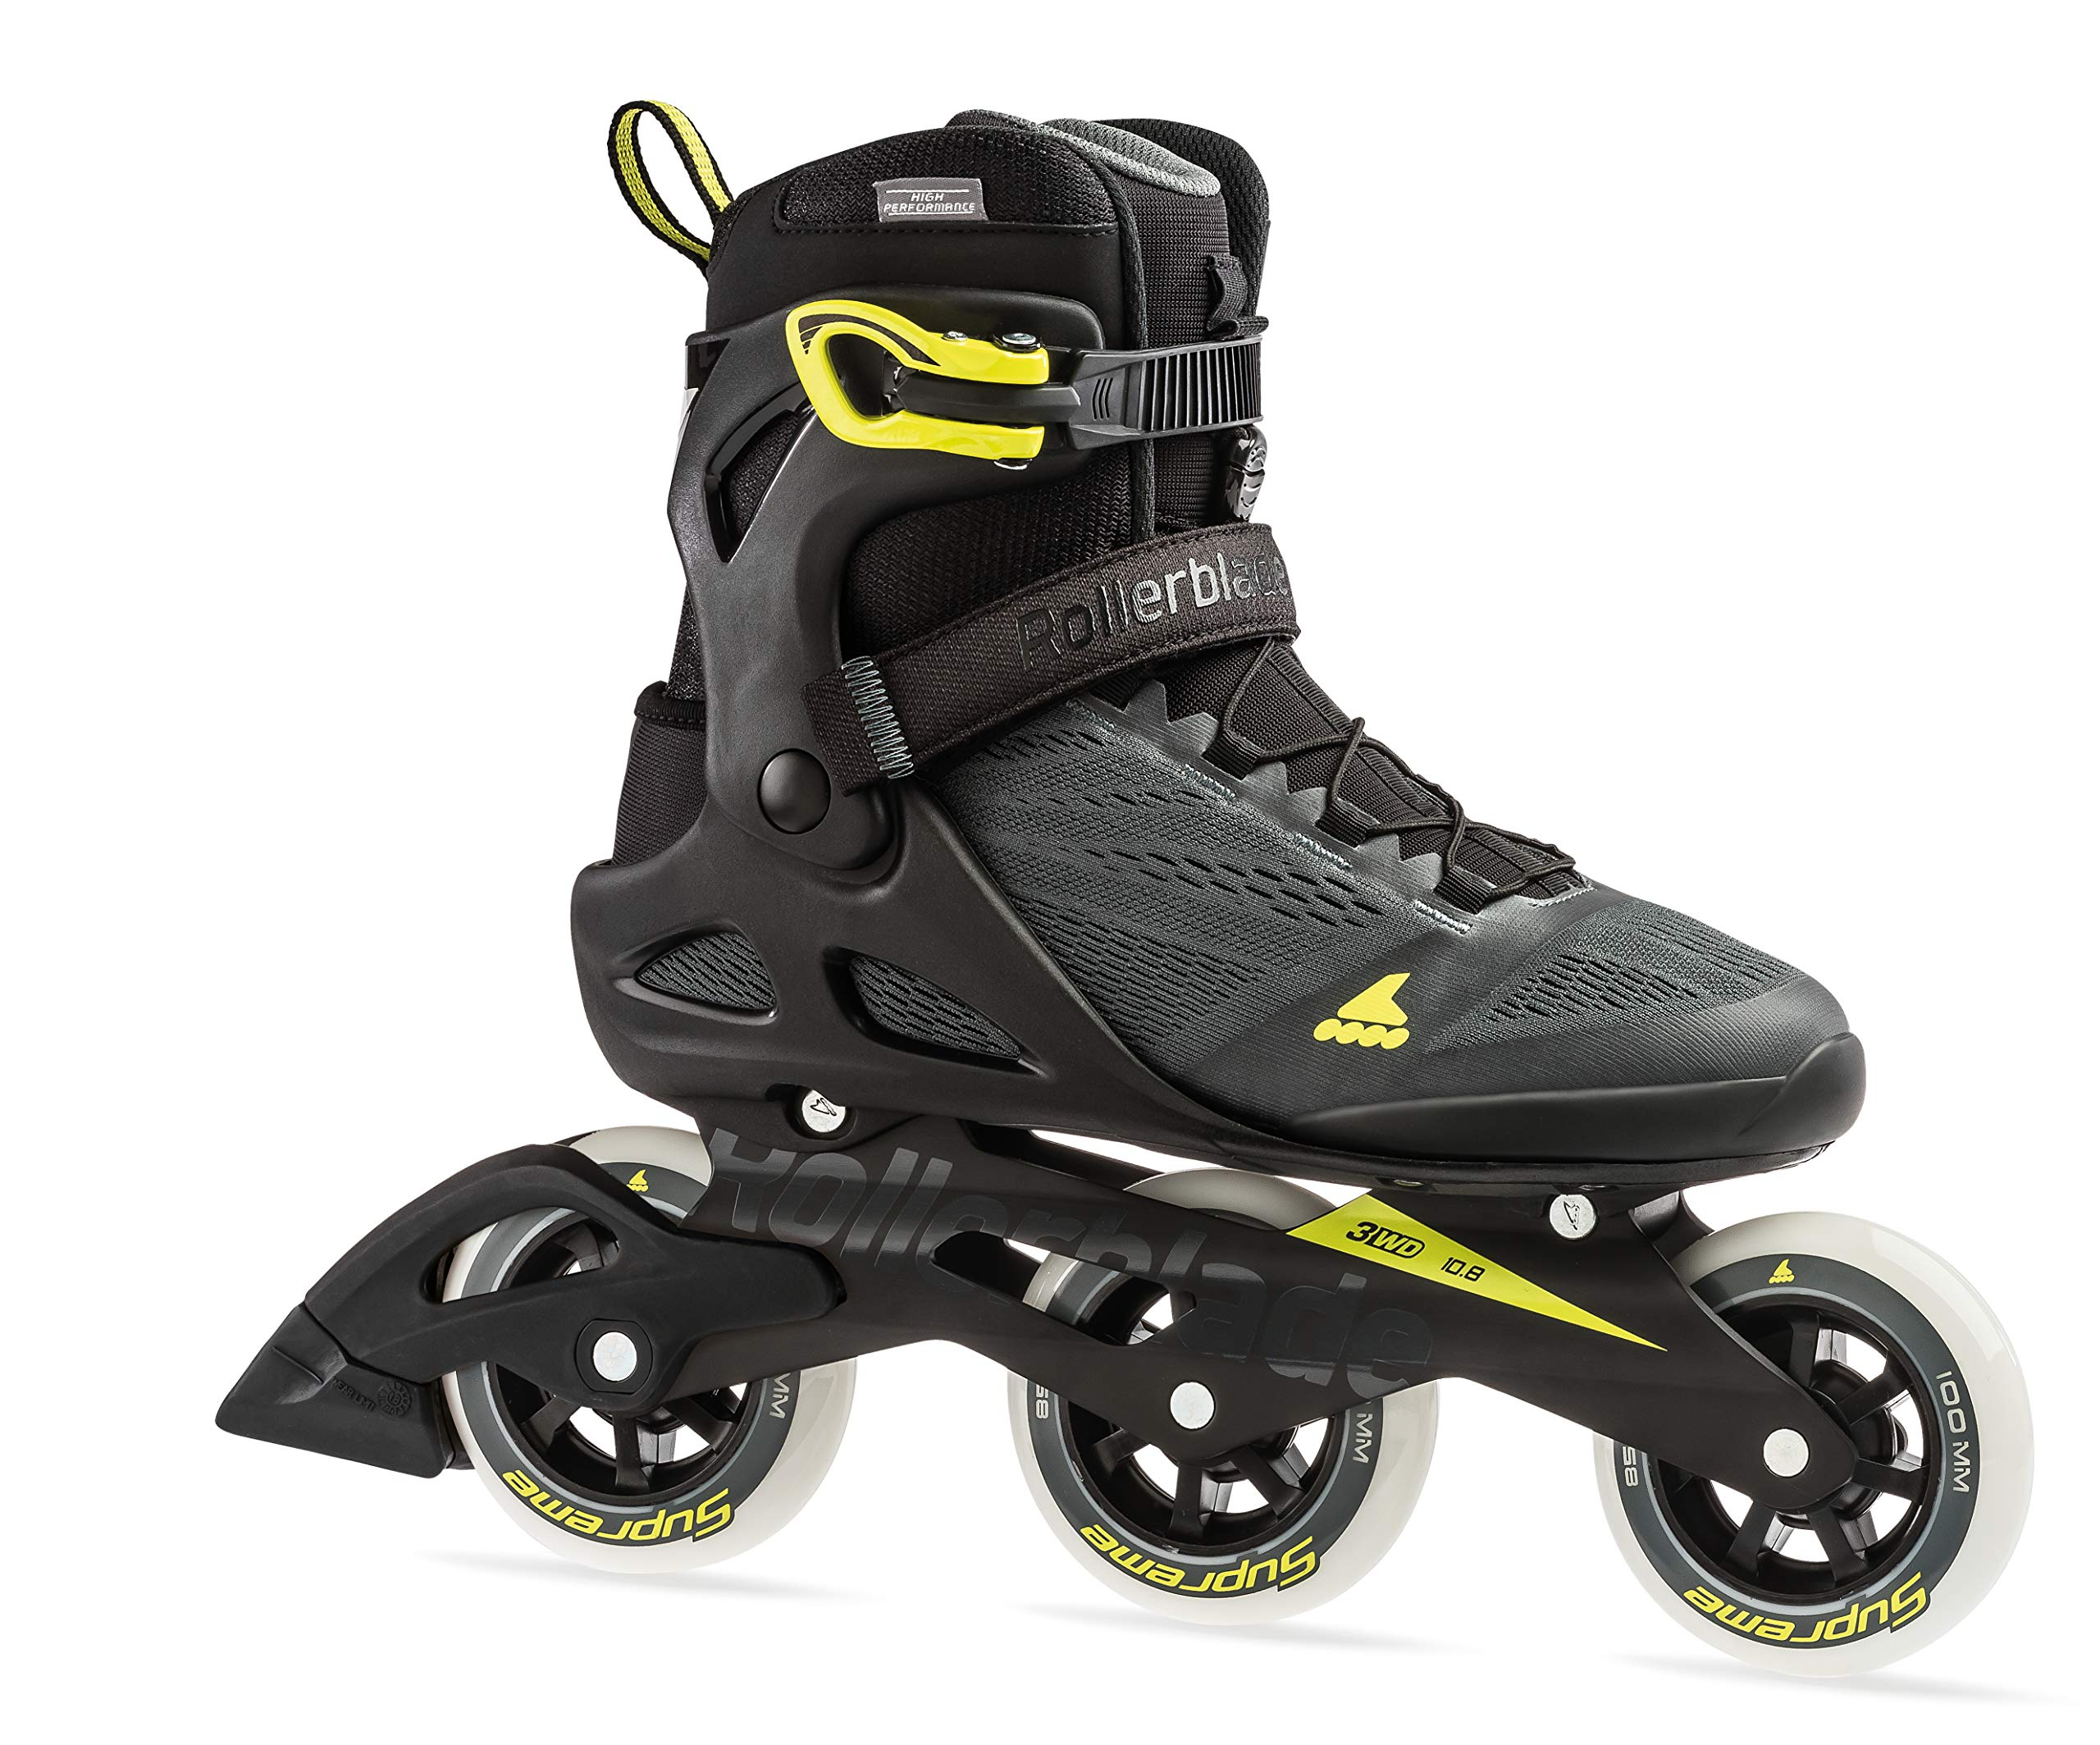 Rollerblade Macroblade 100 3Wd Men's Adult Fitness Inline Skate, Anthracite/Neon Yellow, Medium 6